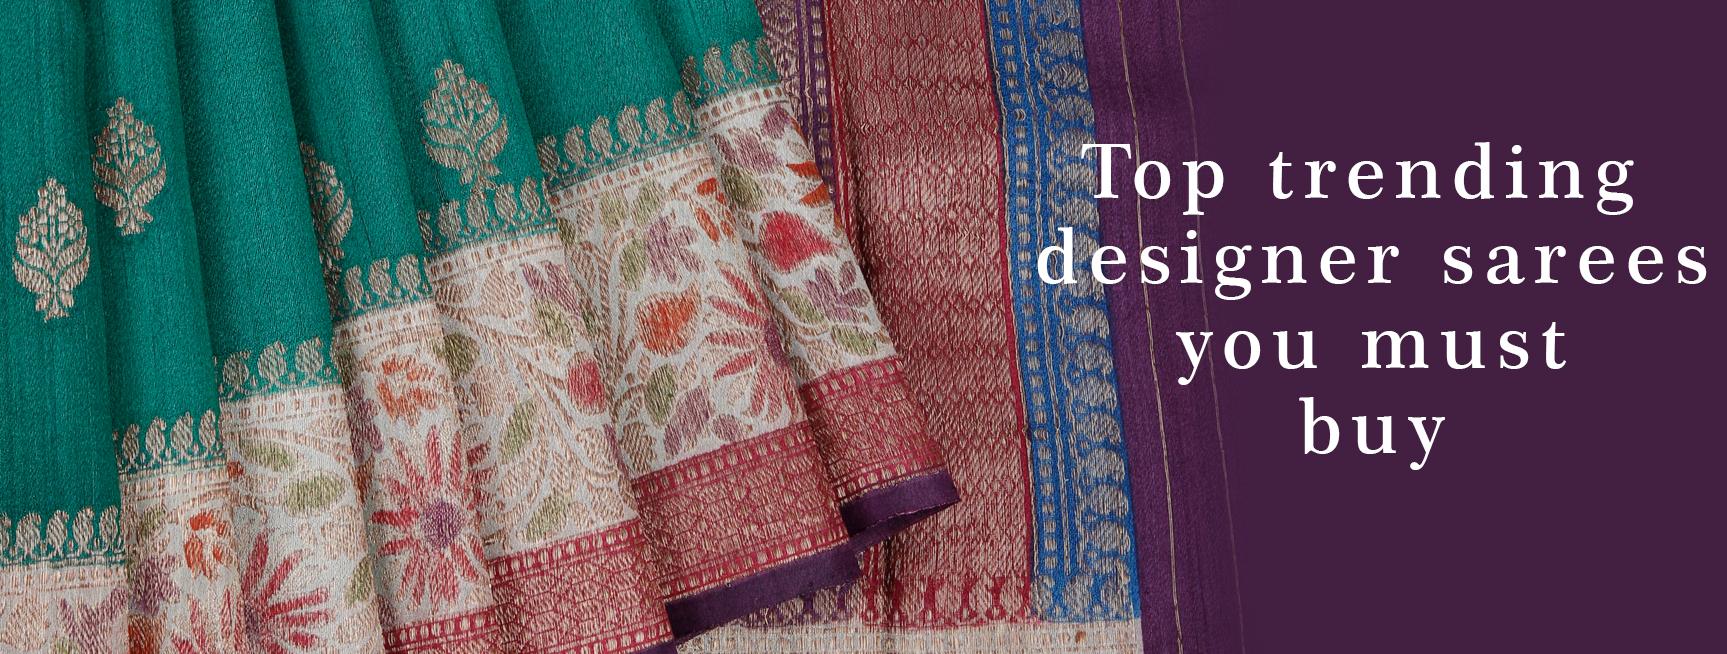 Top Trending Designer Sarees you must Buy!